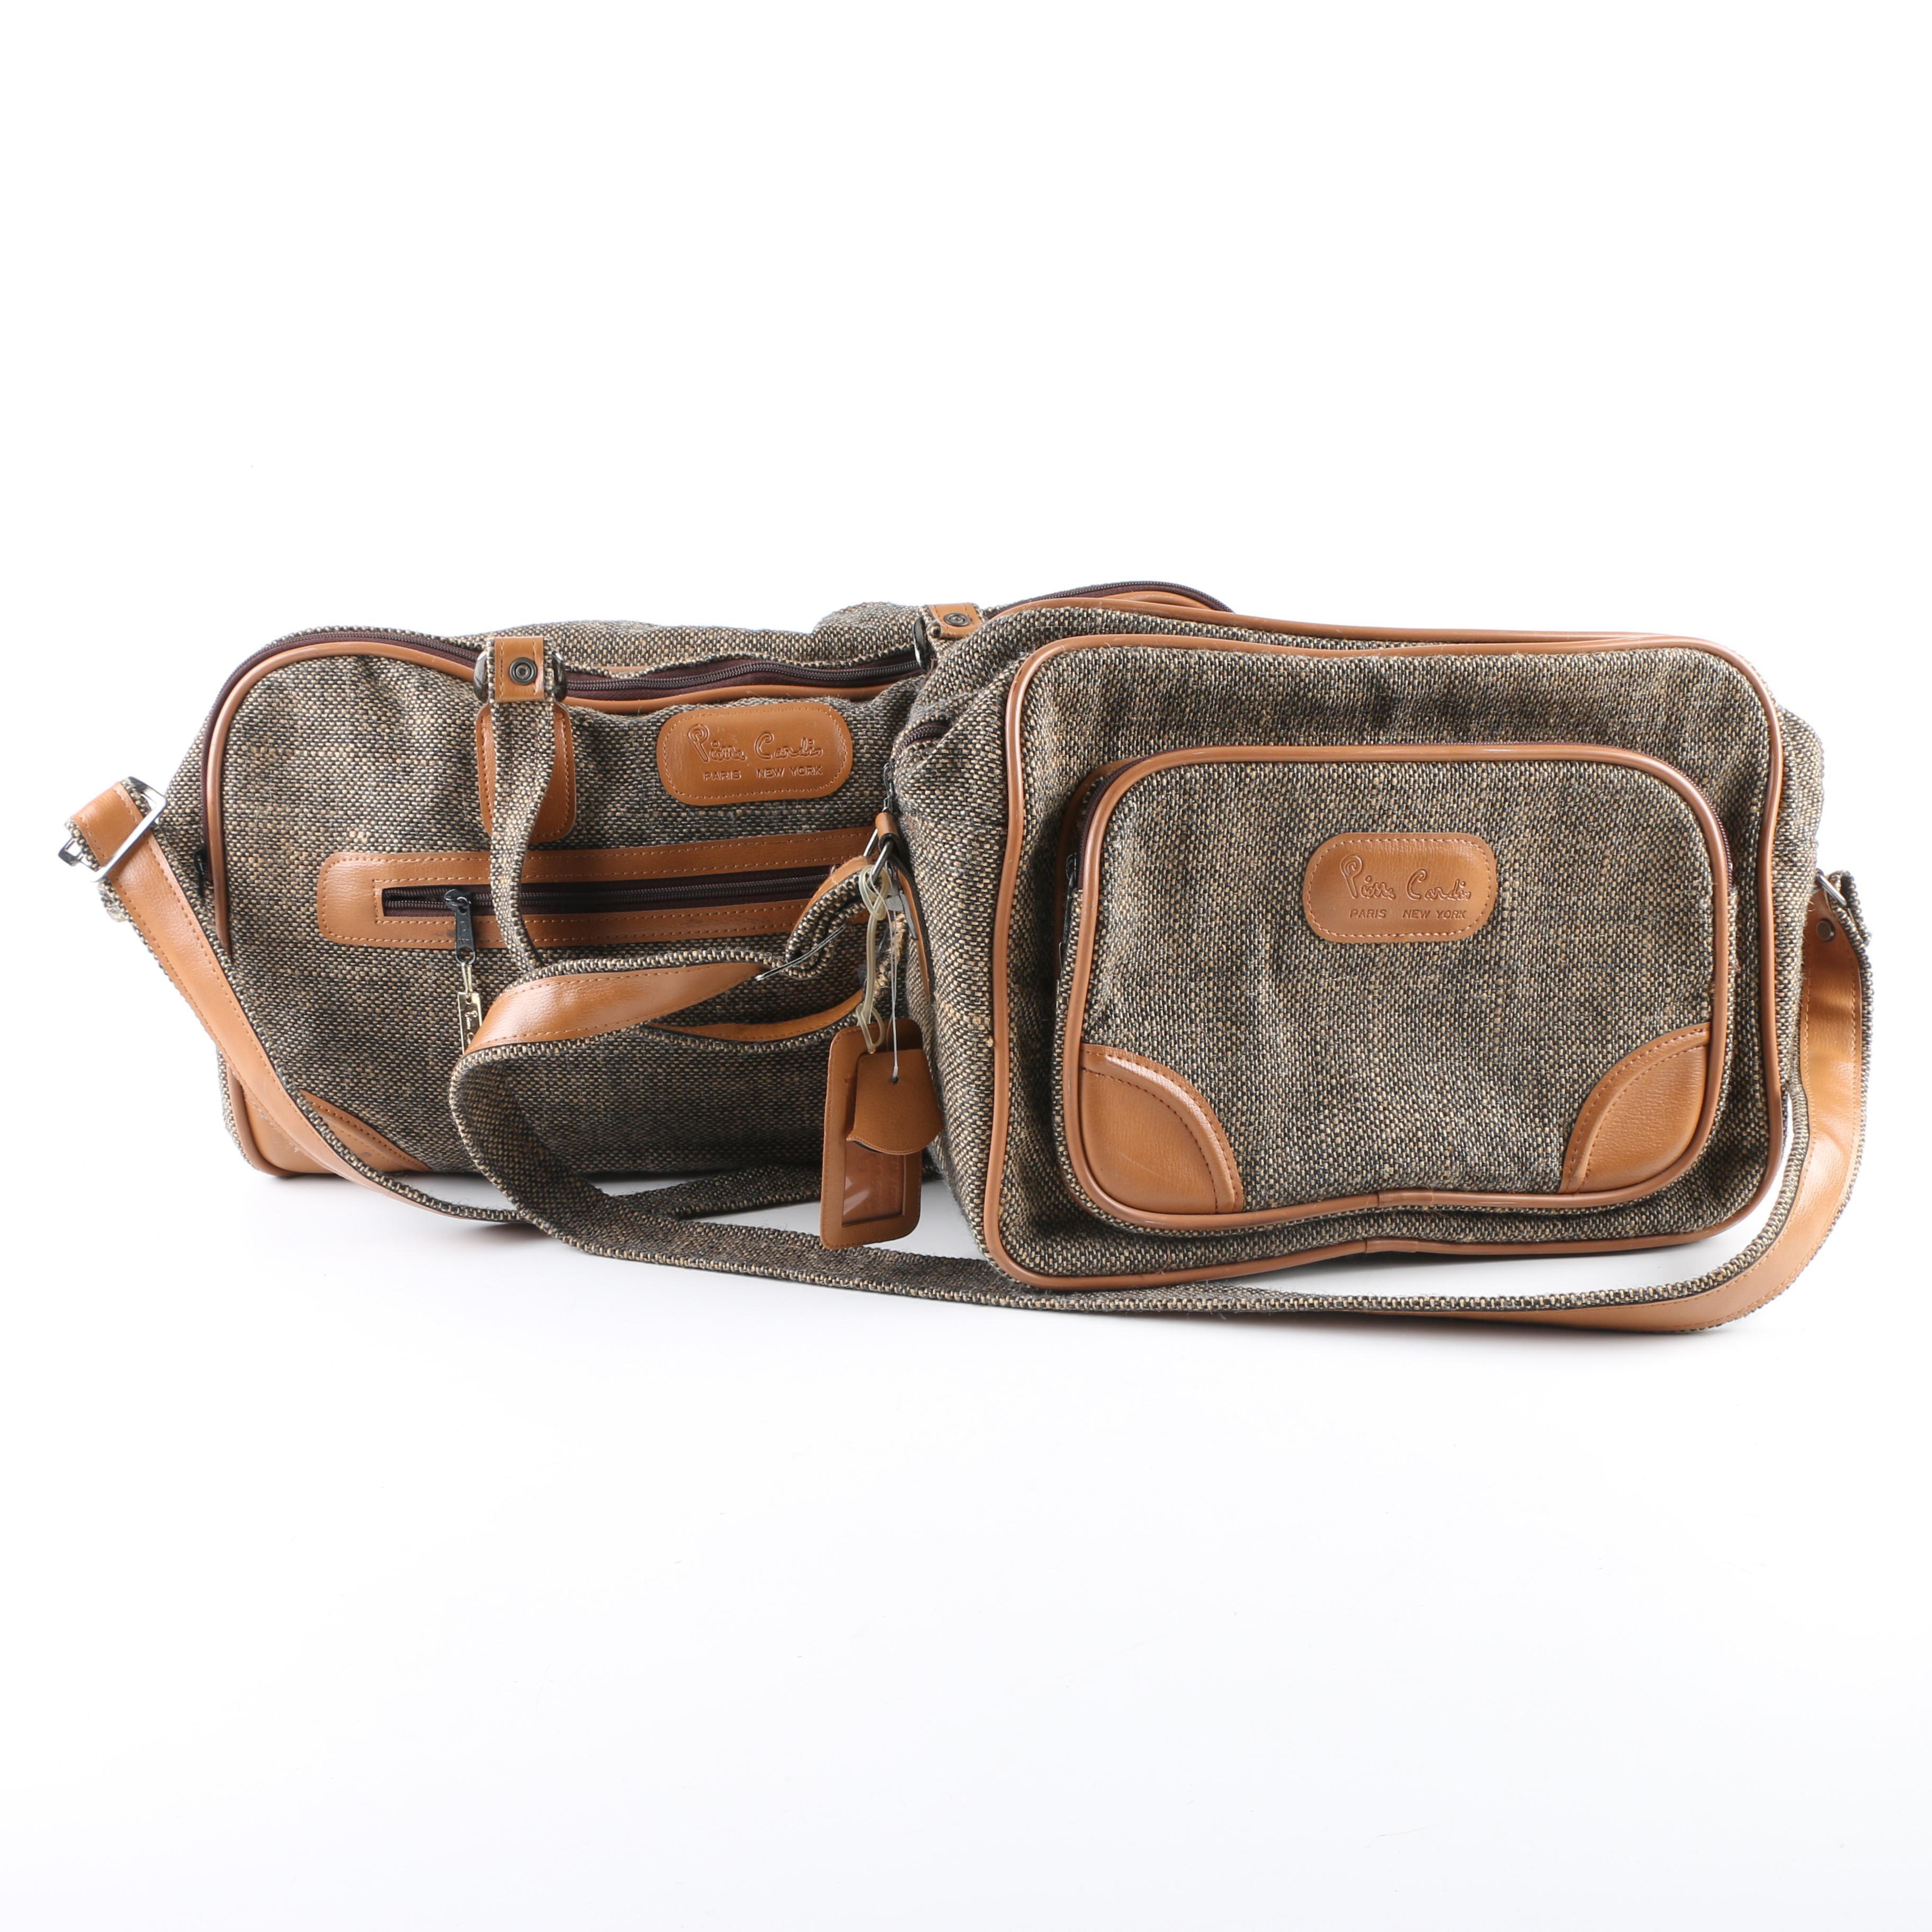 Vintage Pierre Cardin Tweed Duffel and Carry-On Bag